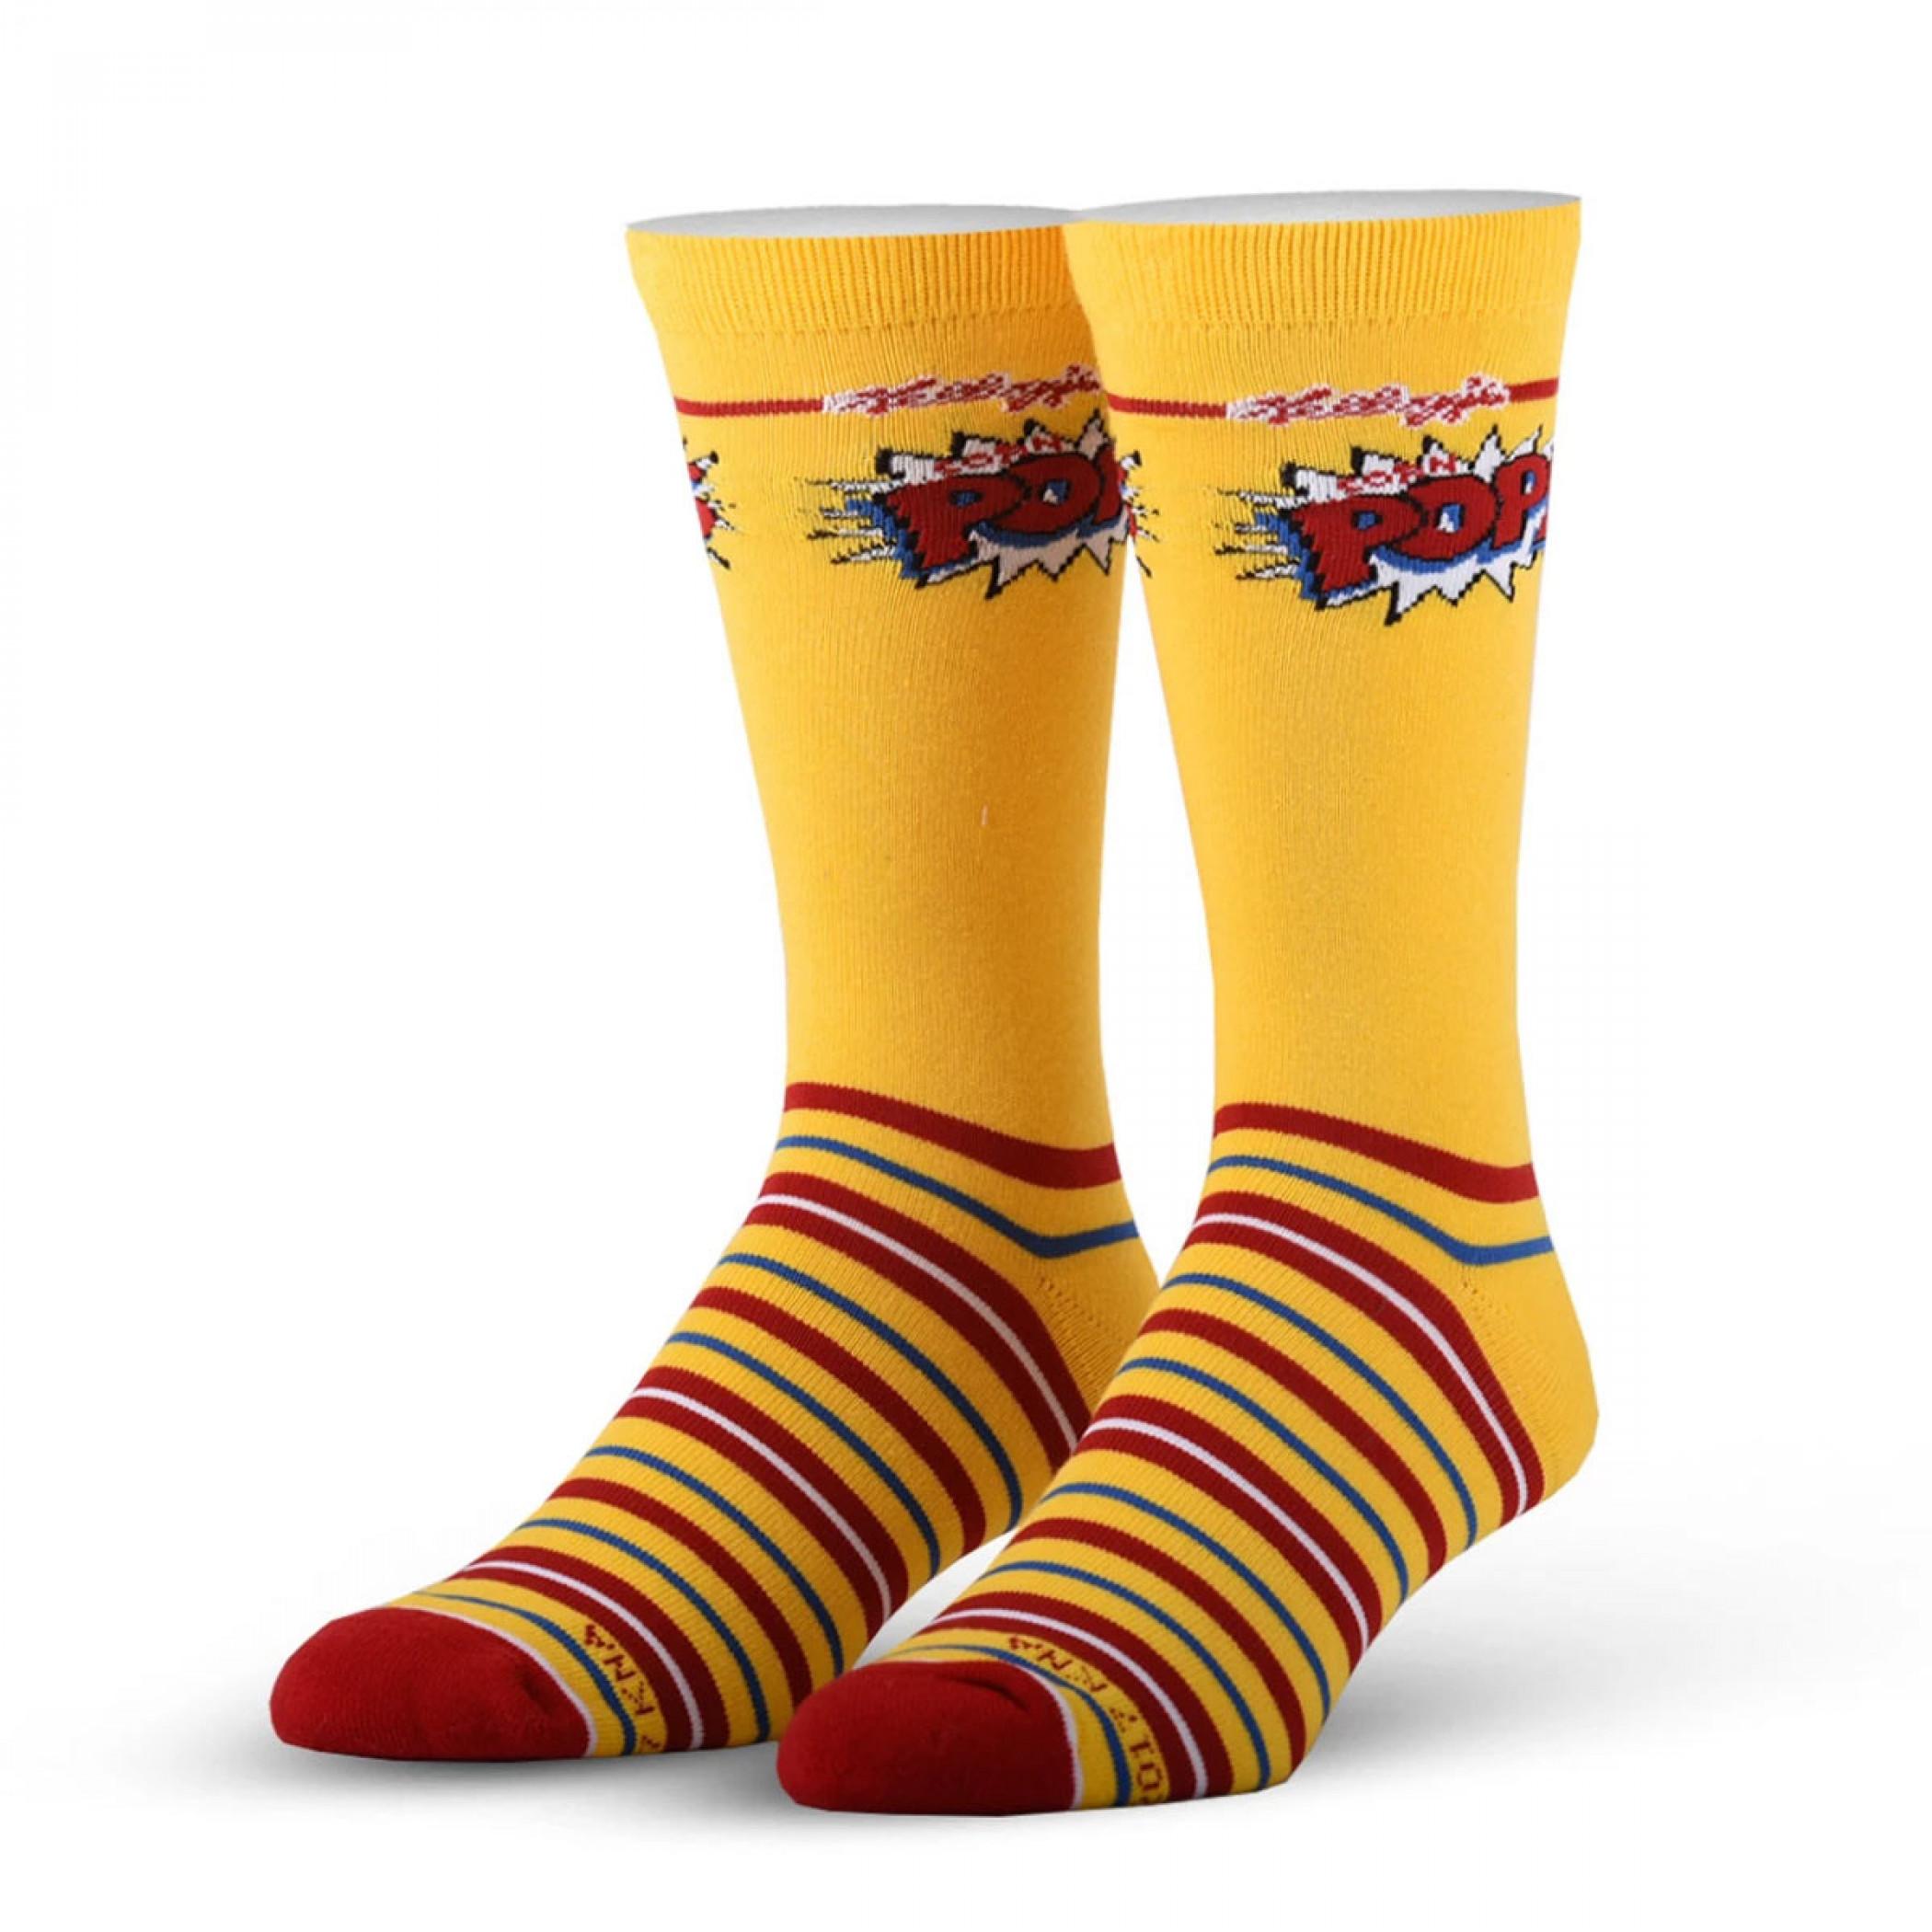 Corn Pops Yellow Kellogg's Cereal Socks